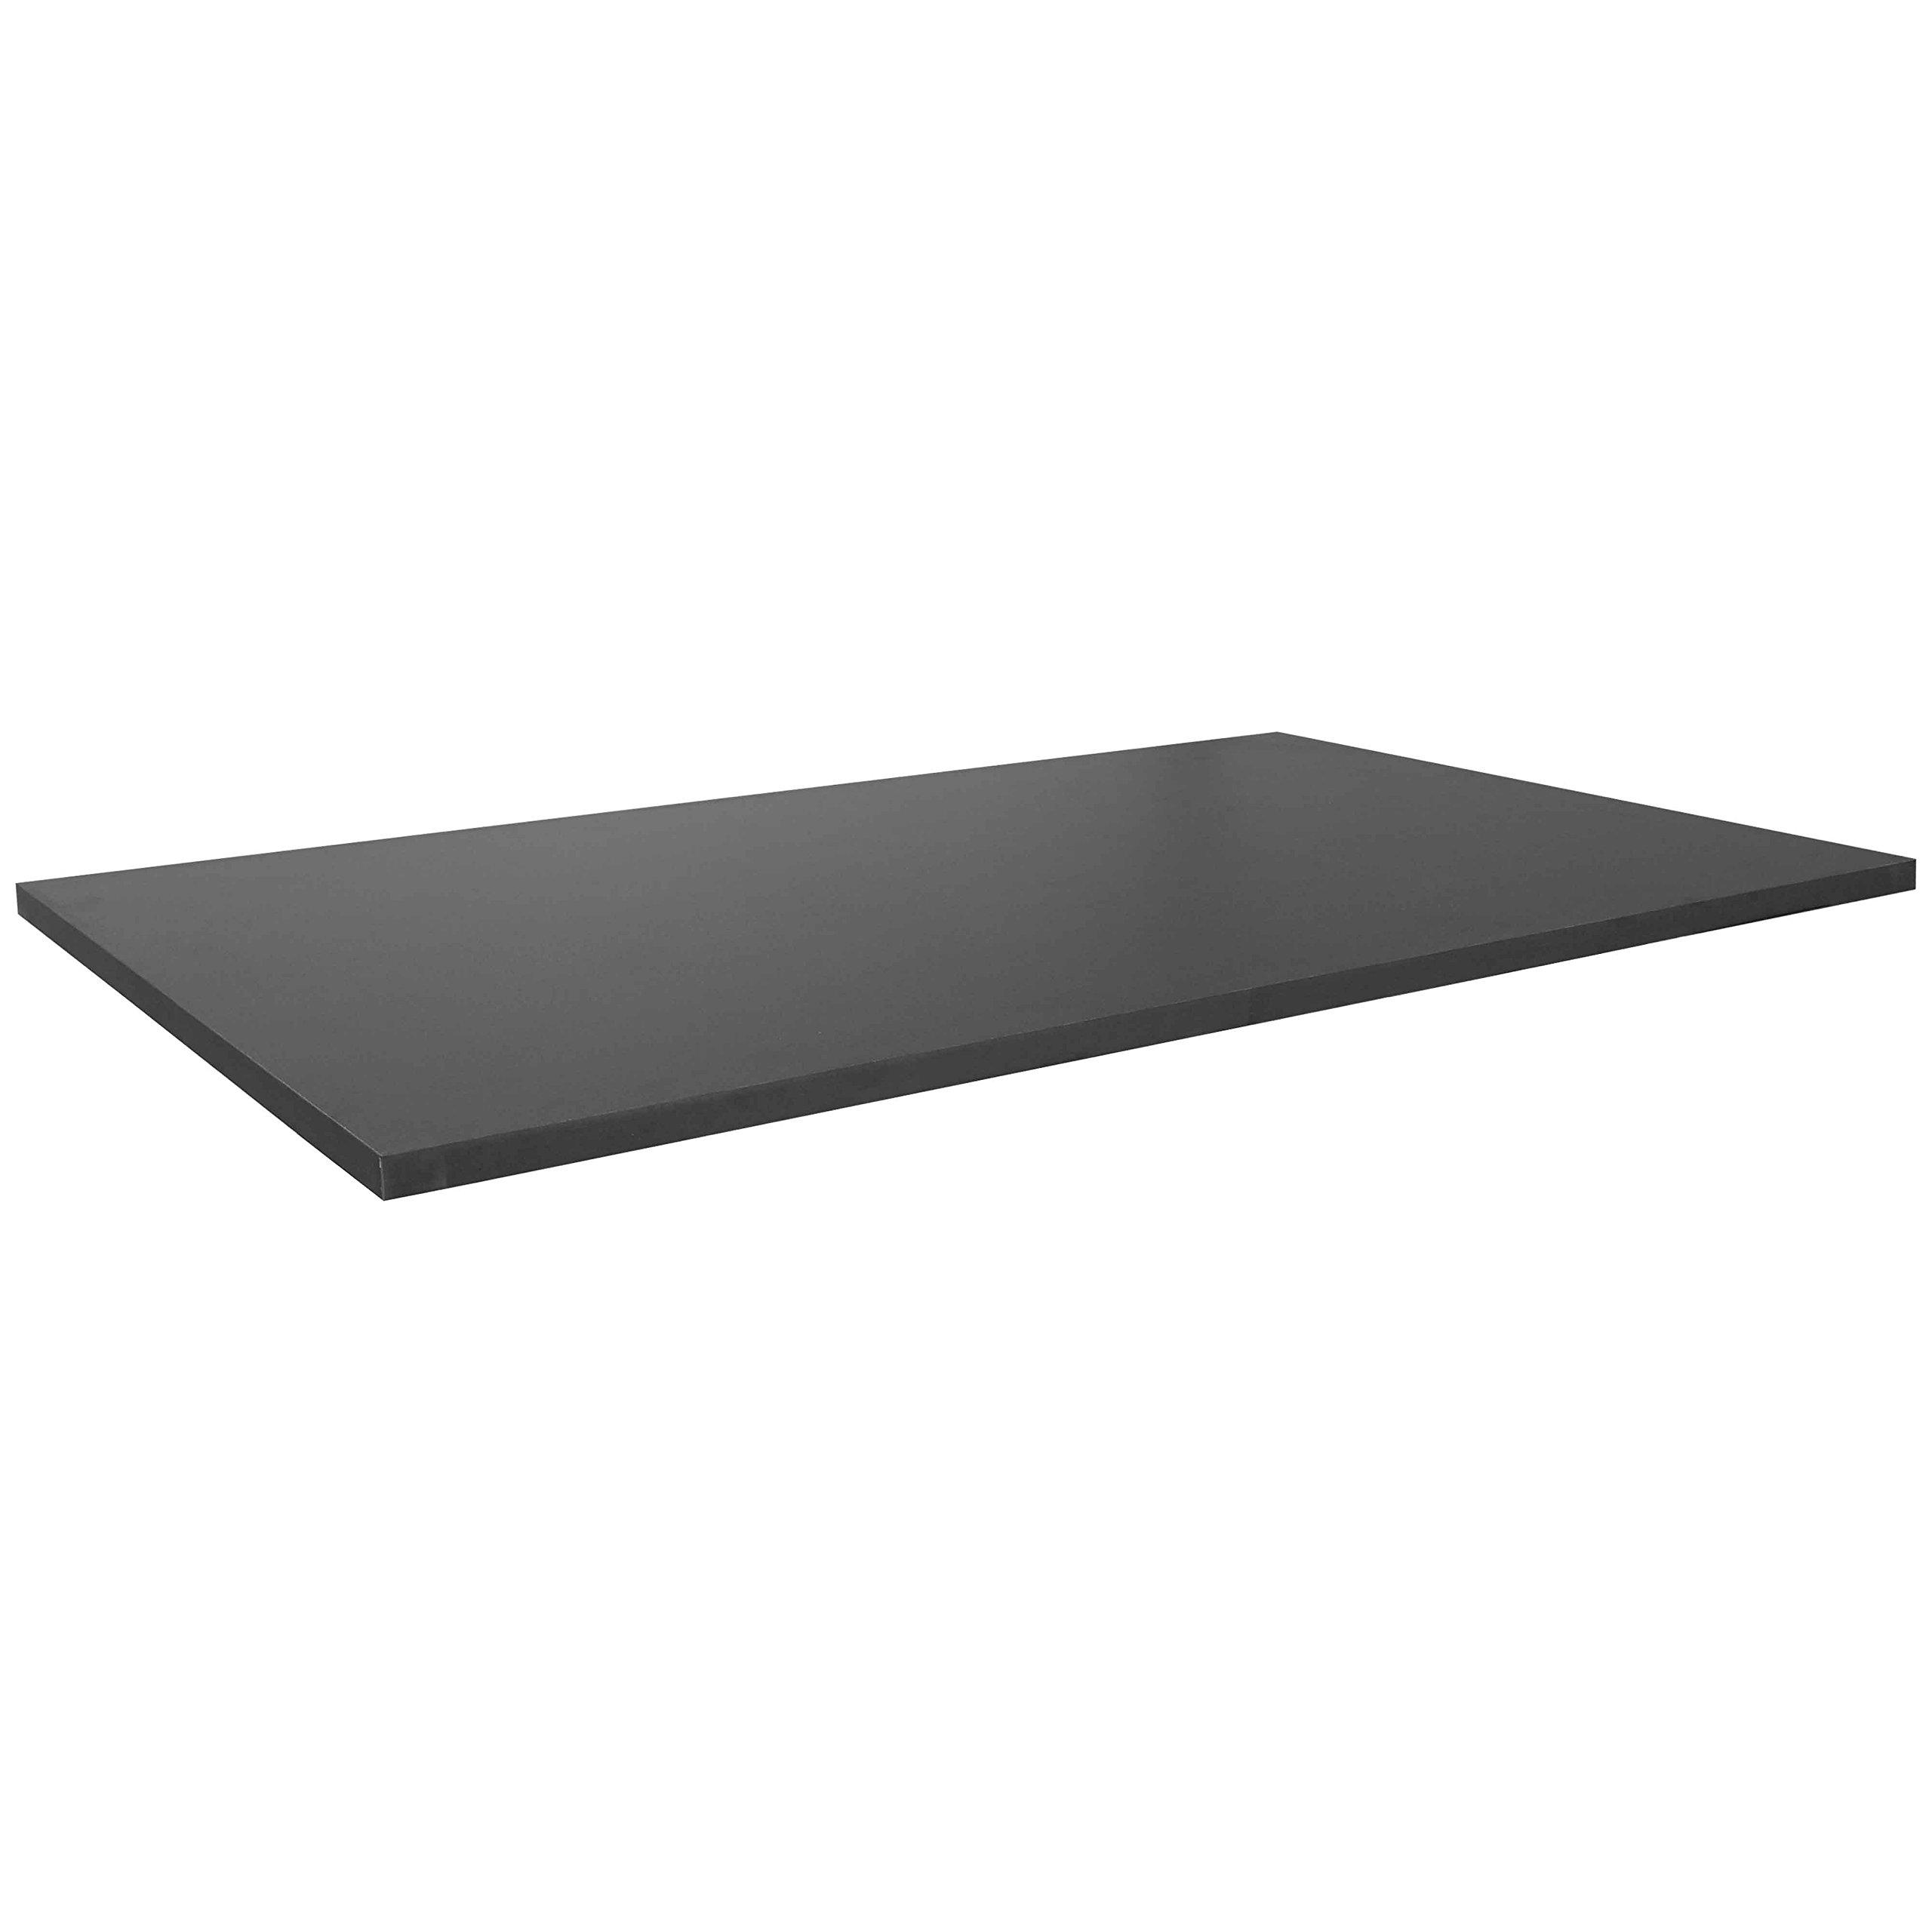 Titan Universal Desk Top - 30'' x 48'' Black